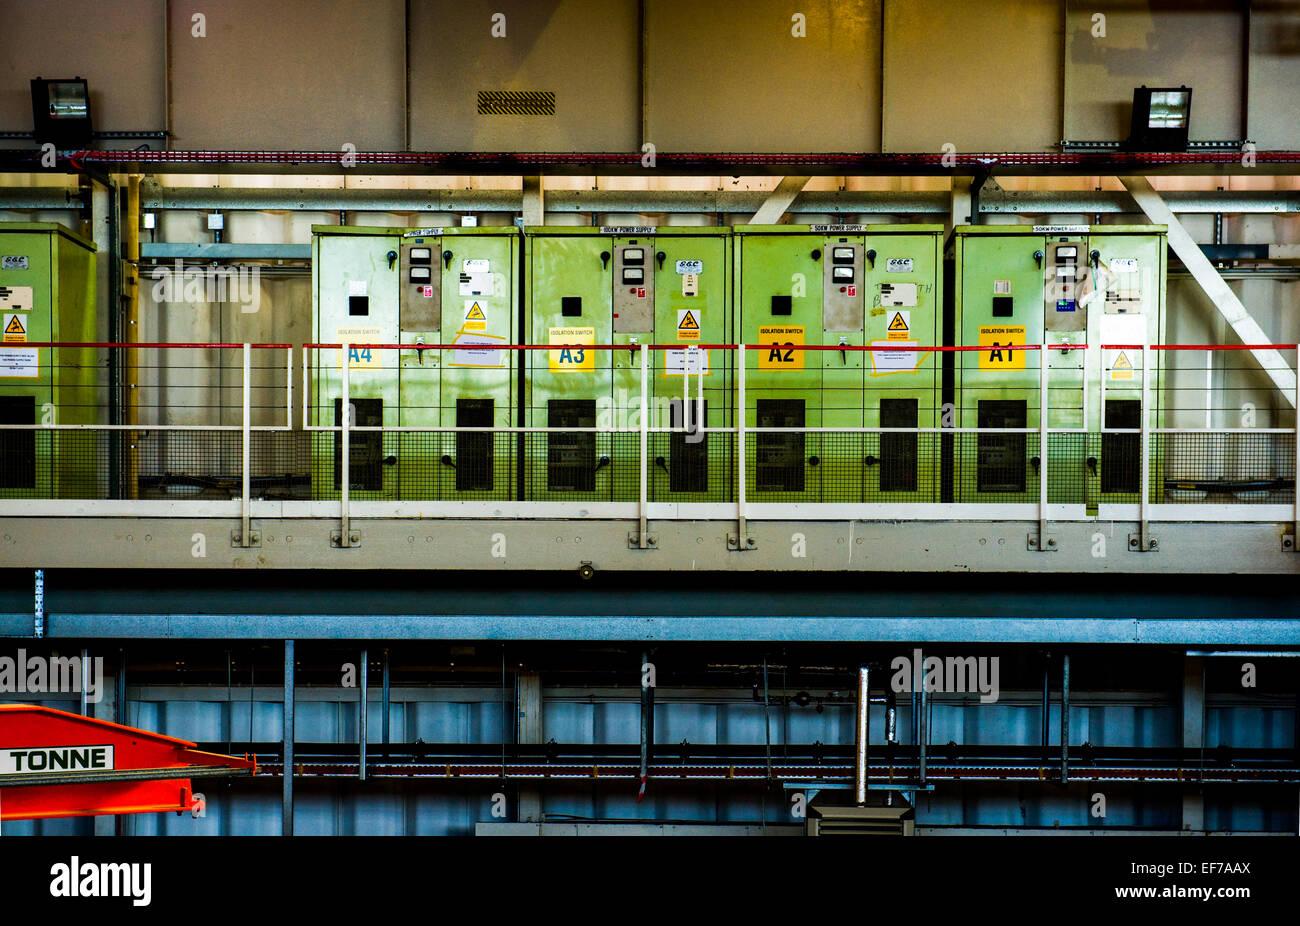 La station cible ISIS à Harwell 1 La Science et Innovation Centre, Oxfordshire, UK Photo Stock